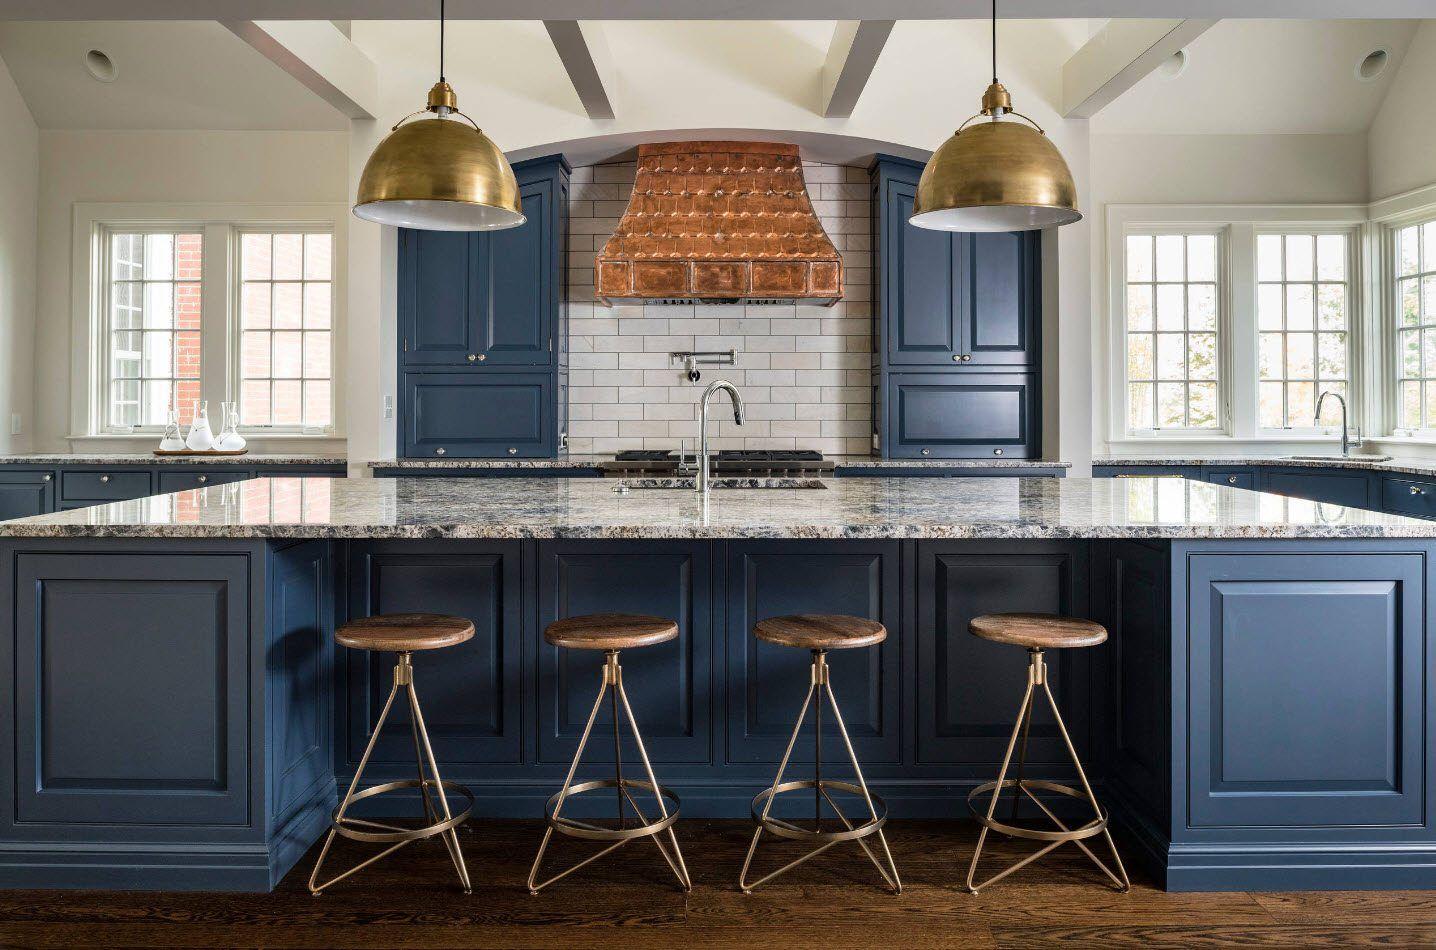 120 Square Feet Kitchen Interior Design Ideas with Photos. Classic design in blue